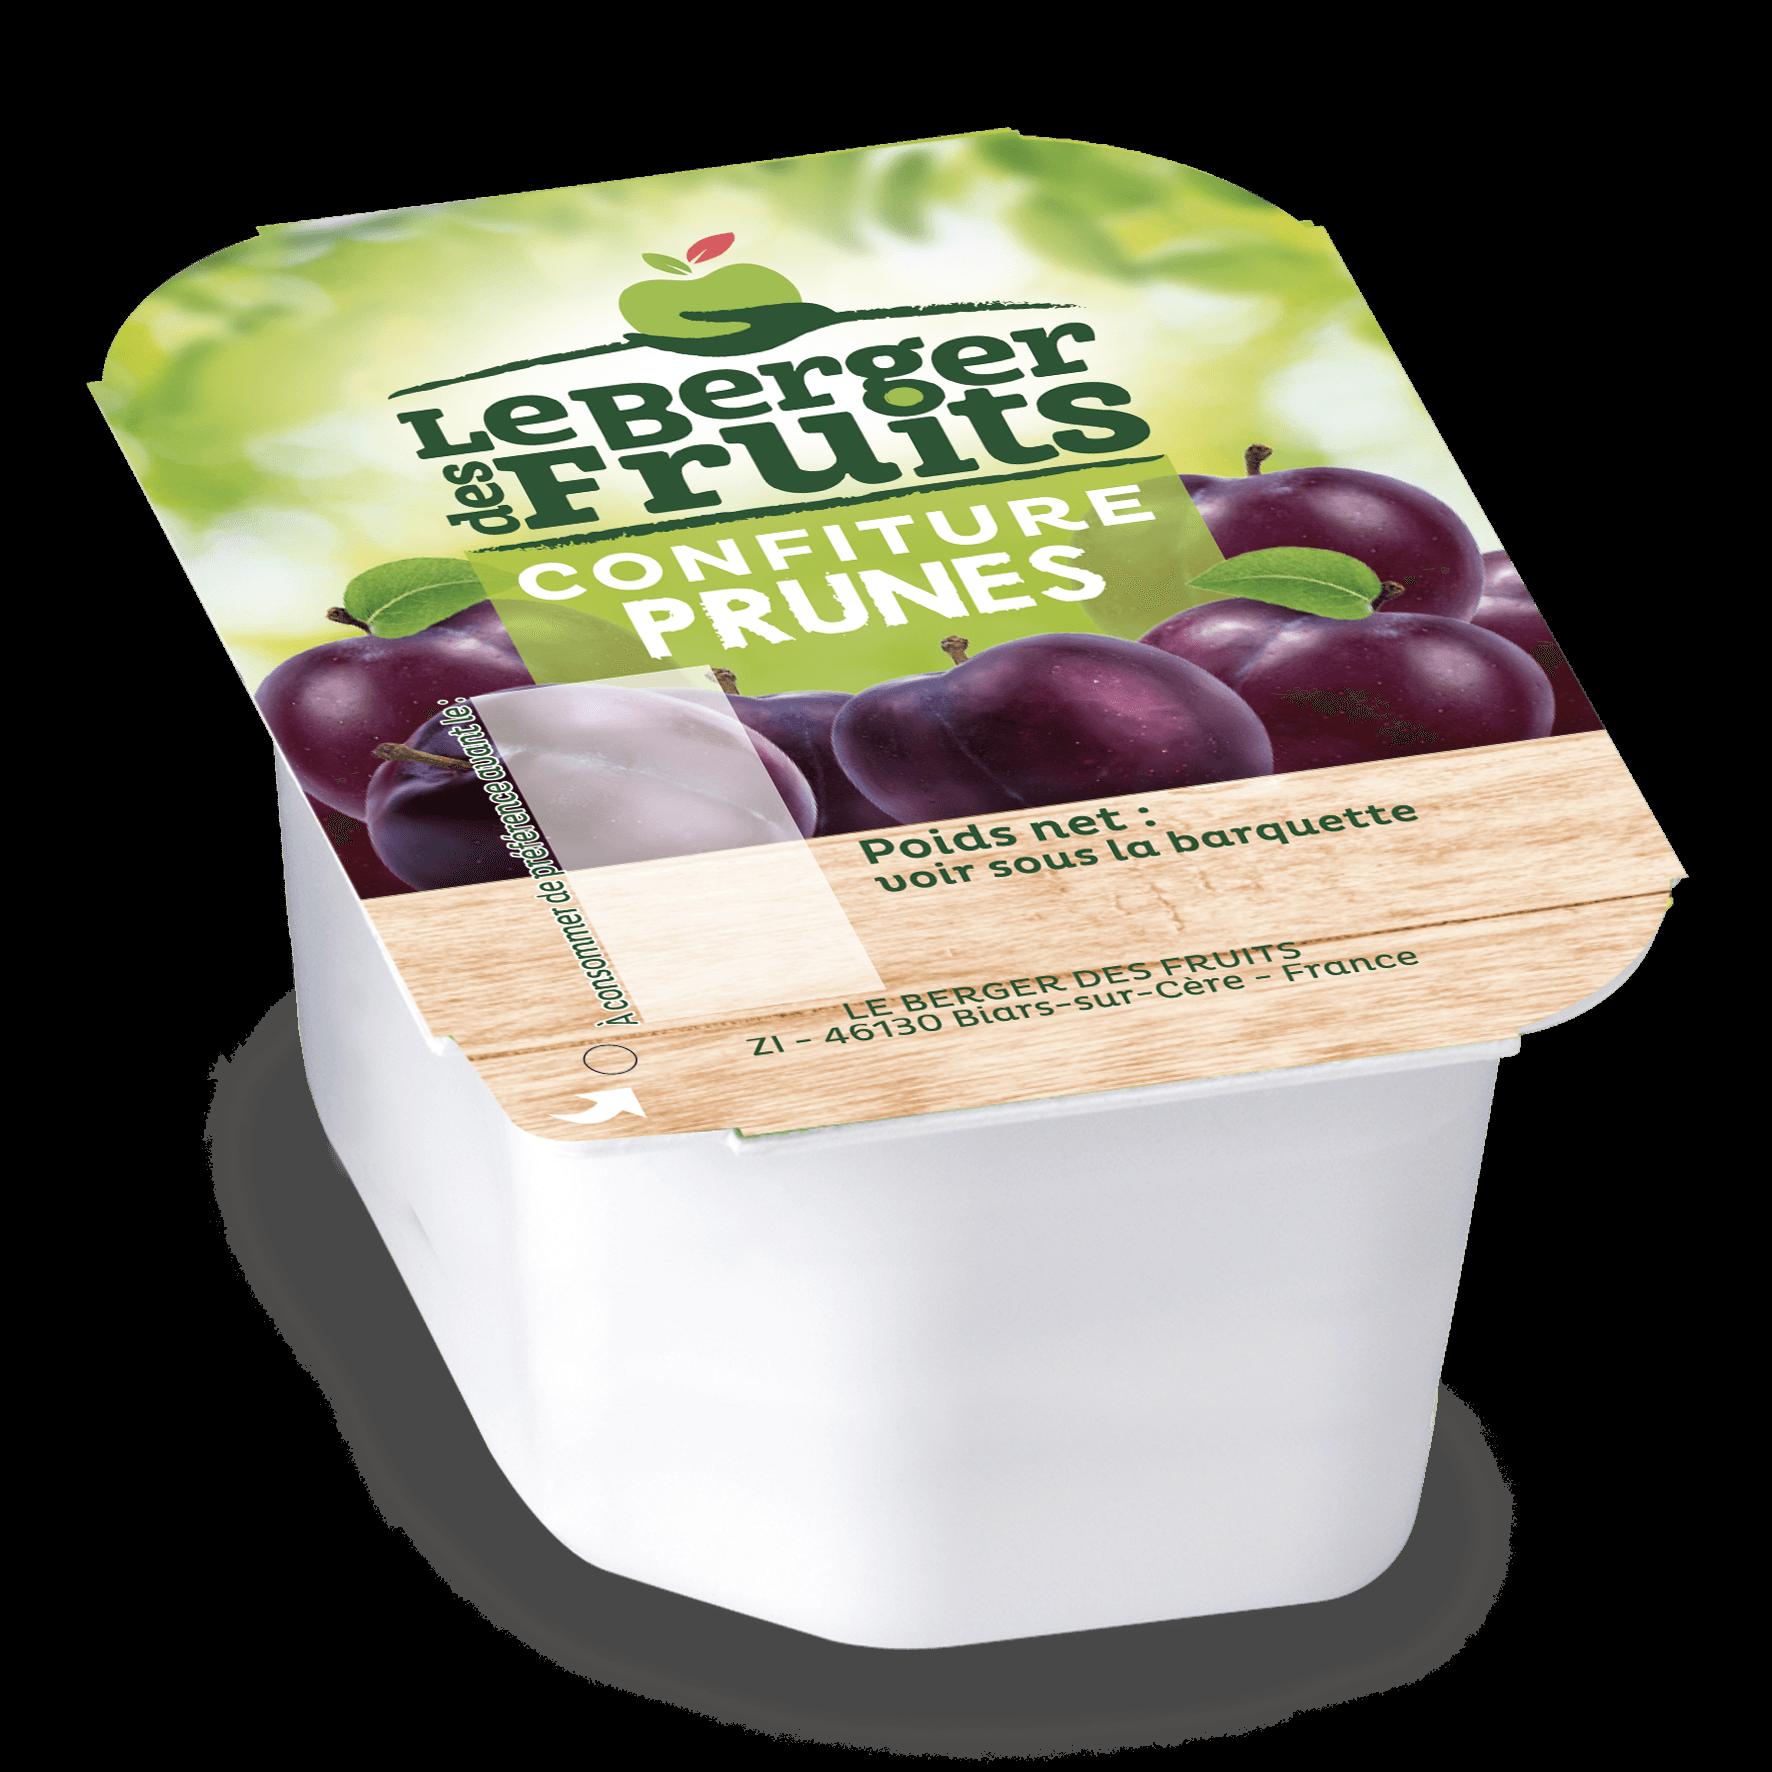 Confitures prune 30 g berger de fruits